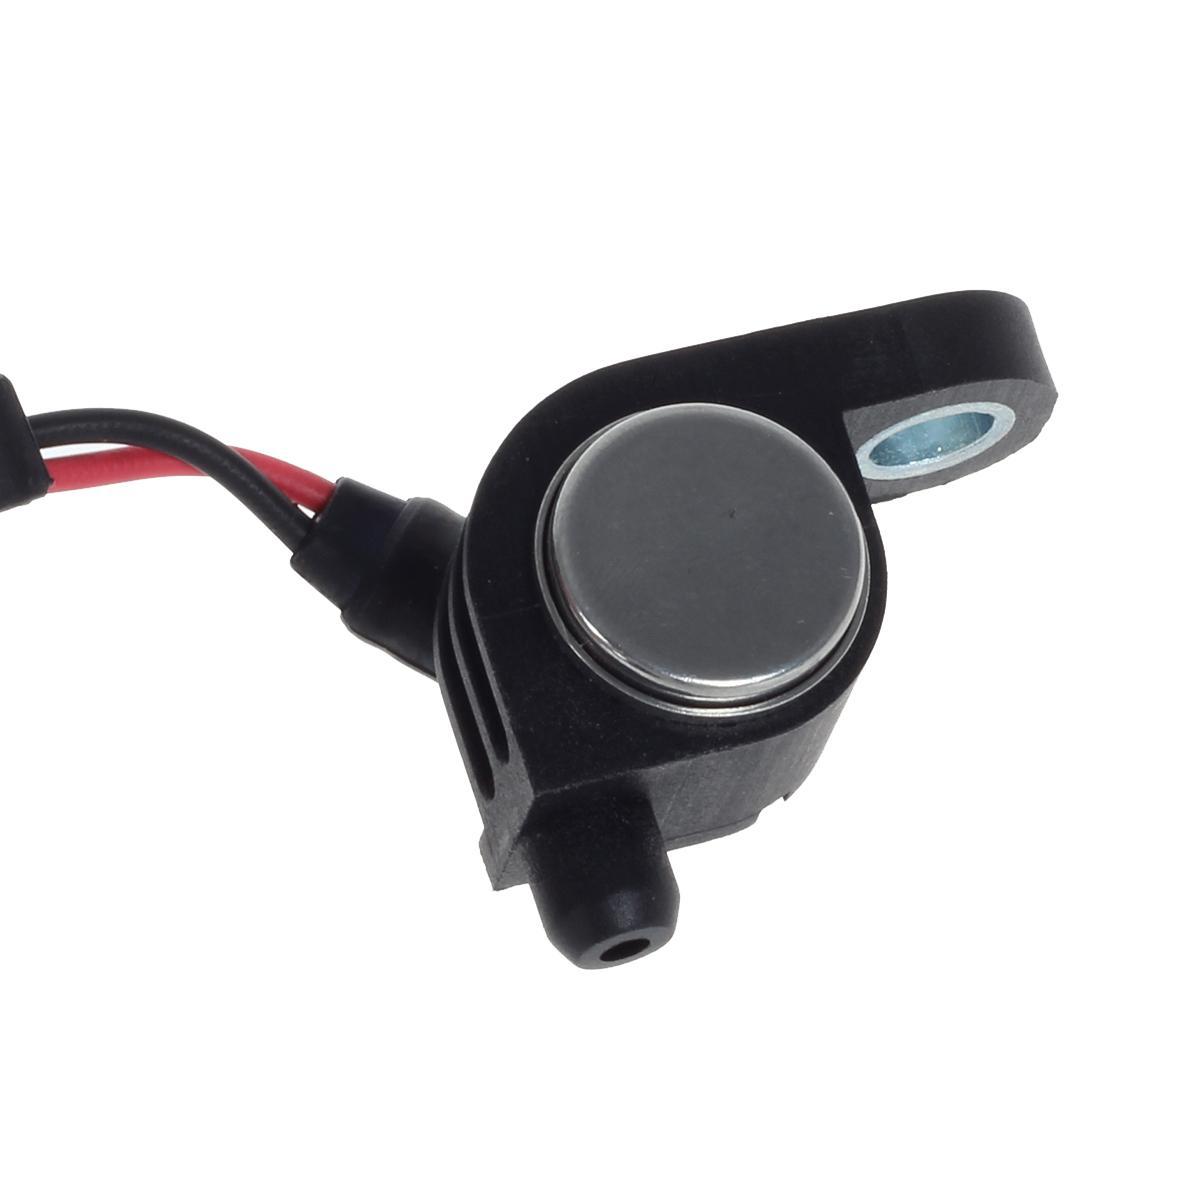 Crank Crankshaft Position Sensor PC133 For 96-1998 Honda